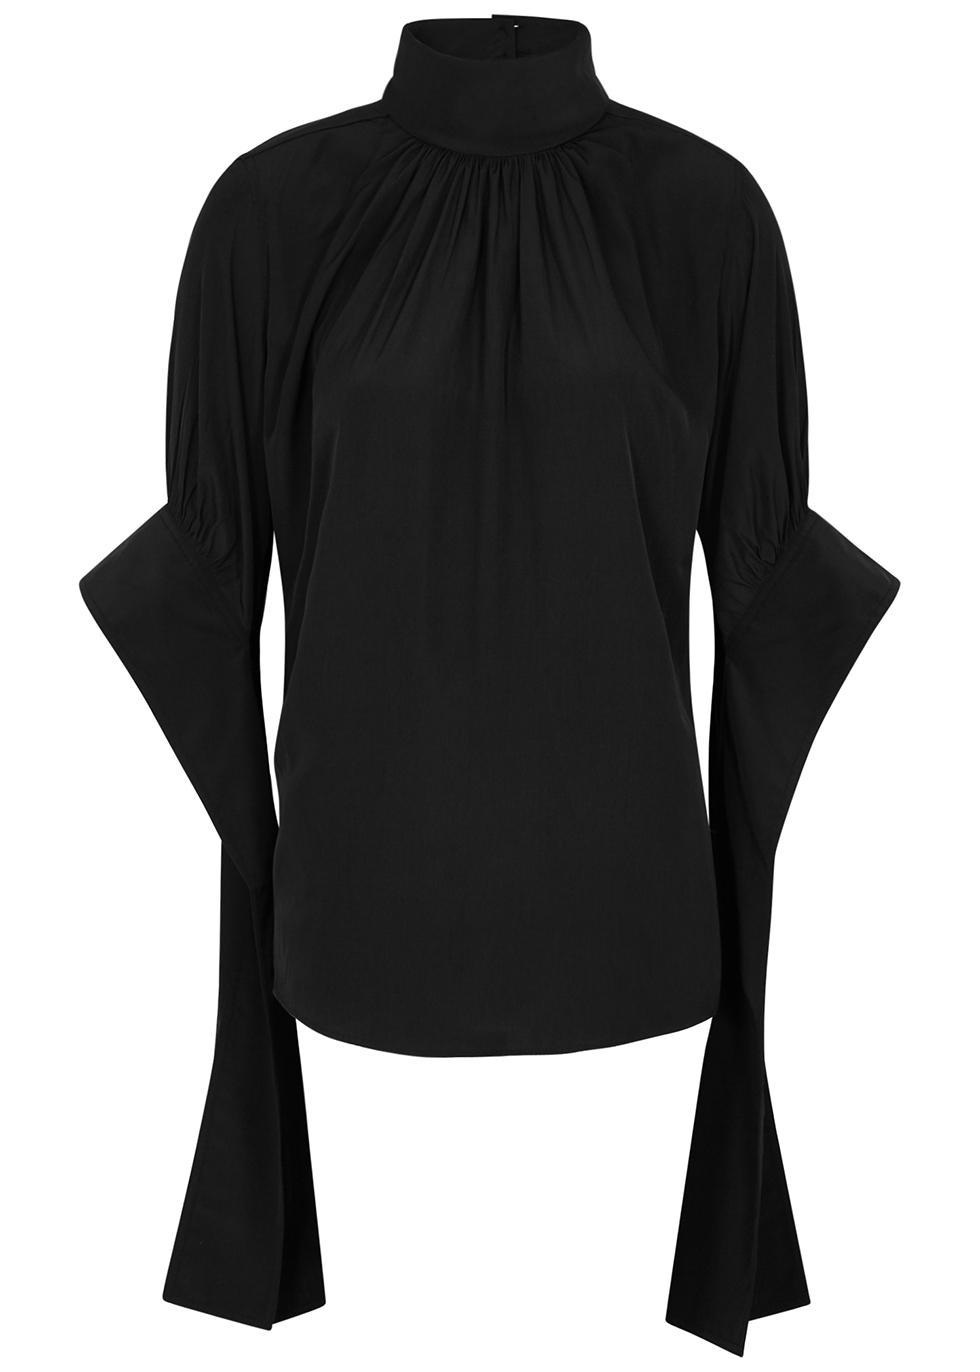 Black draped high-neck top